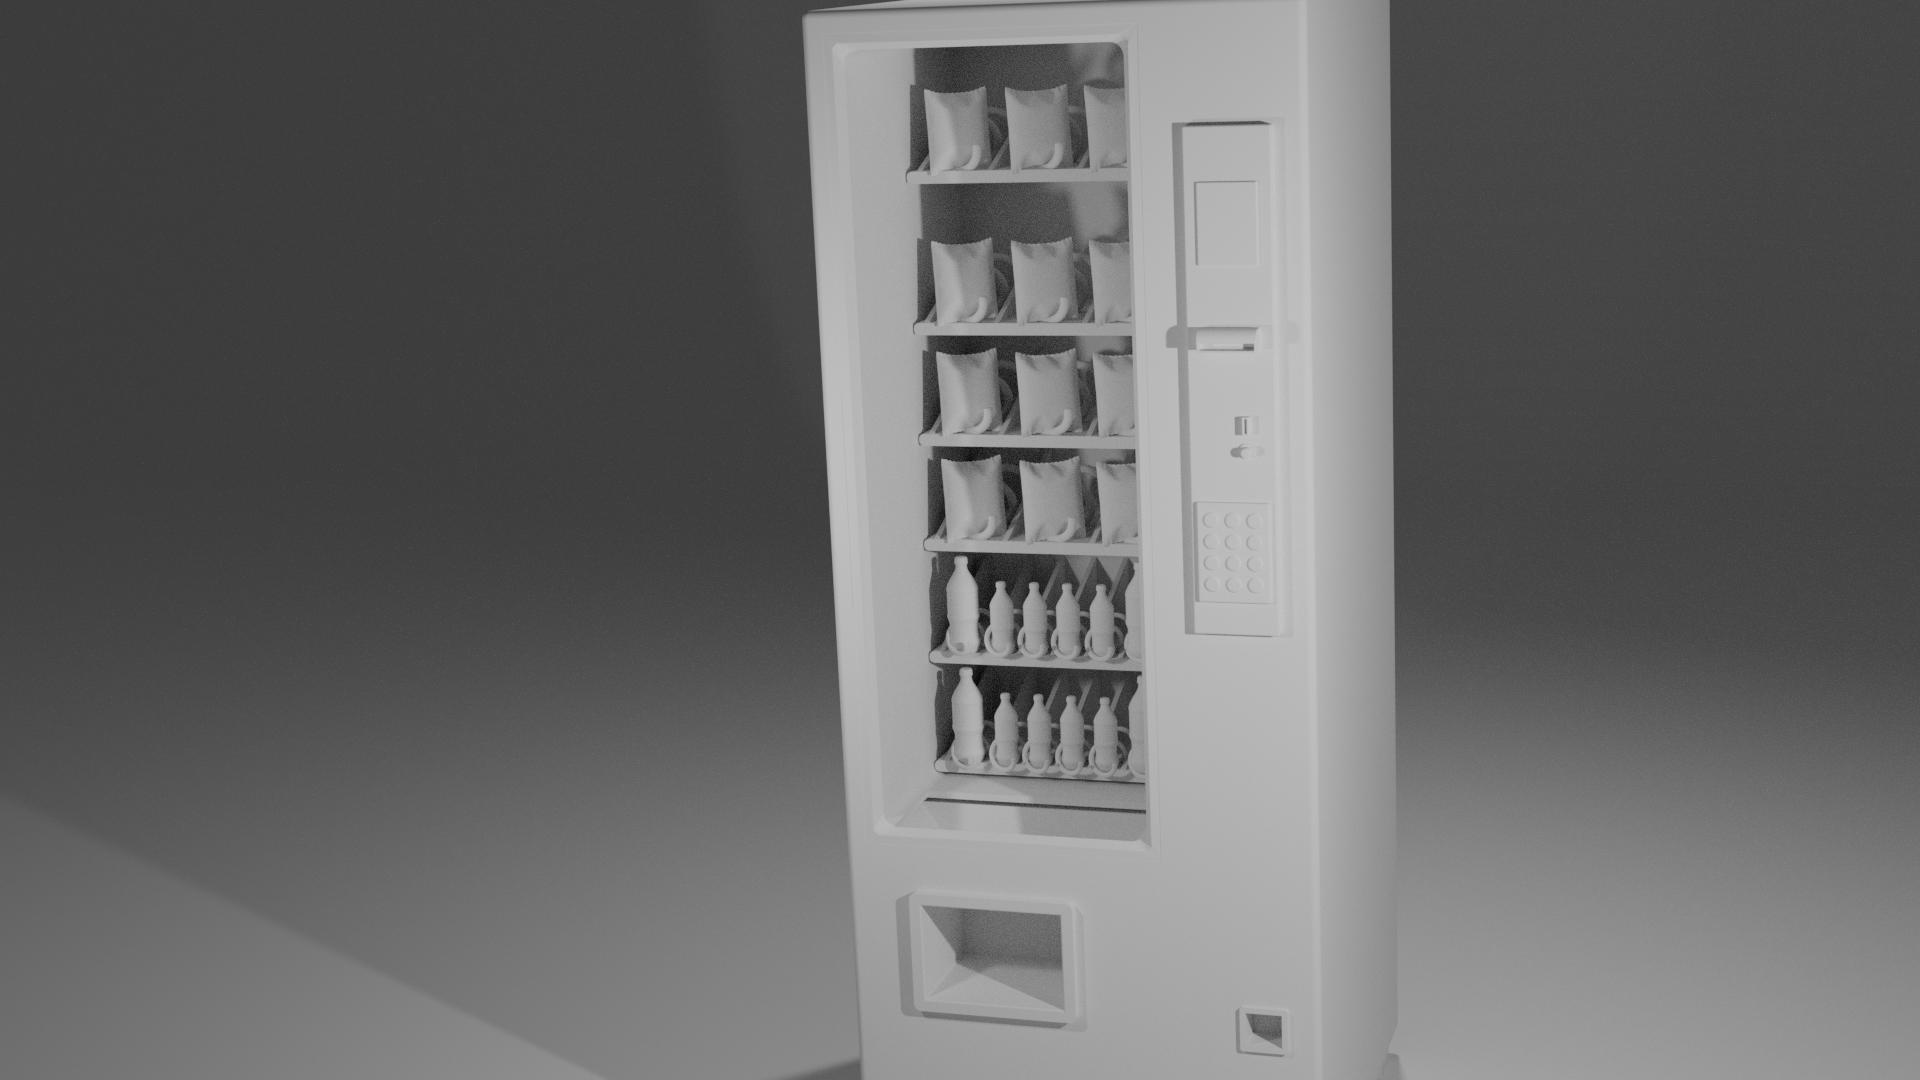 Vending machine 02.png Download free STL file Scale Model Vending Machine • Design to 3D print, itzu